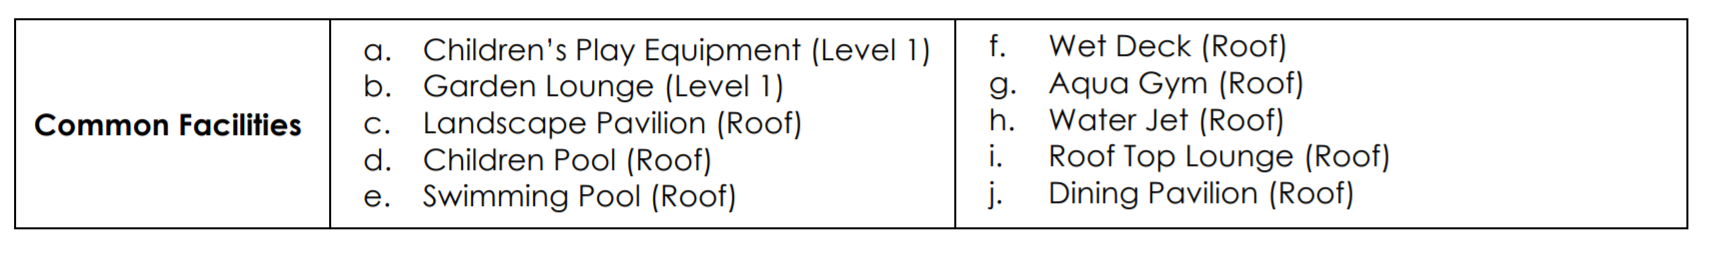 Common-Facilities